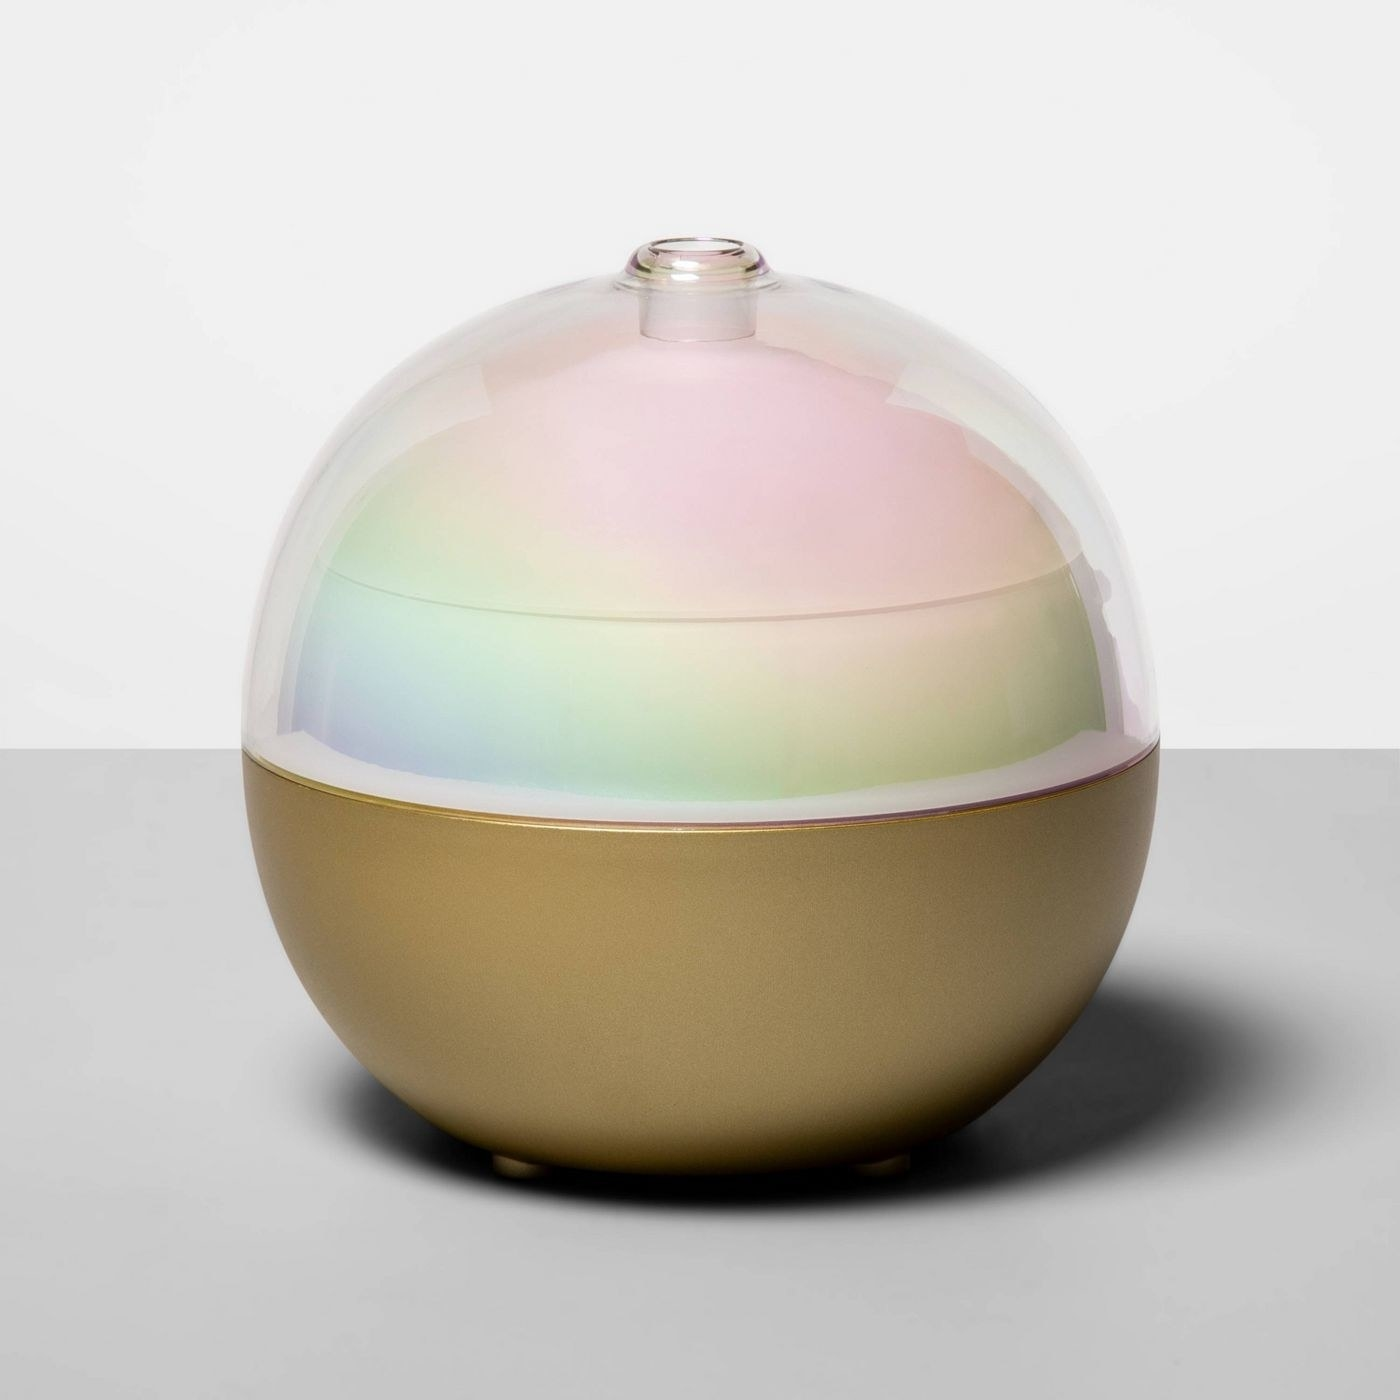 Multi-color oil diffuser with gold base.